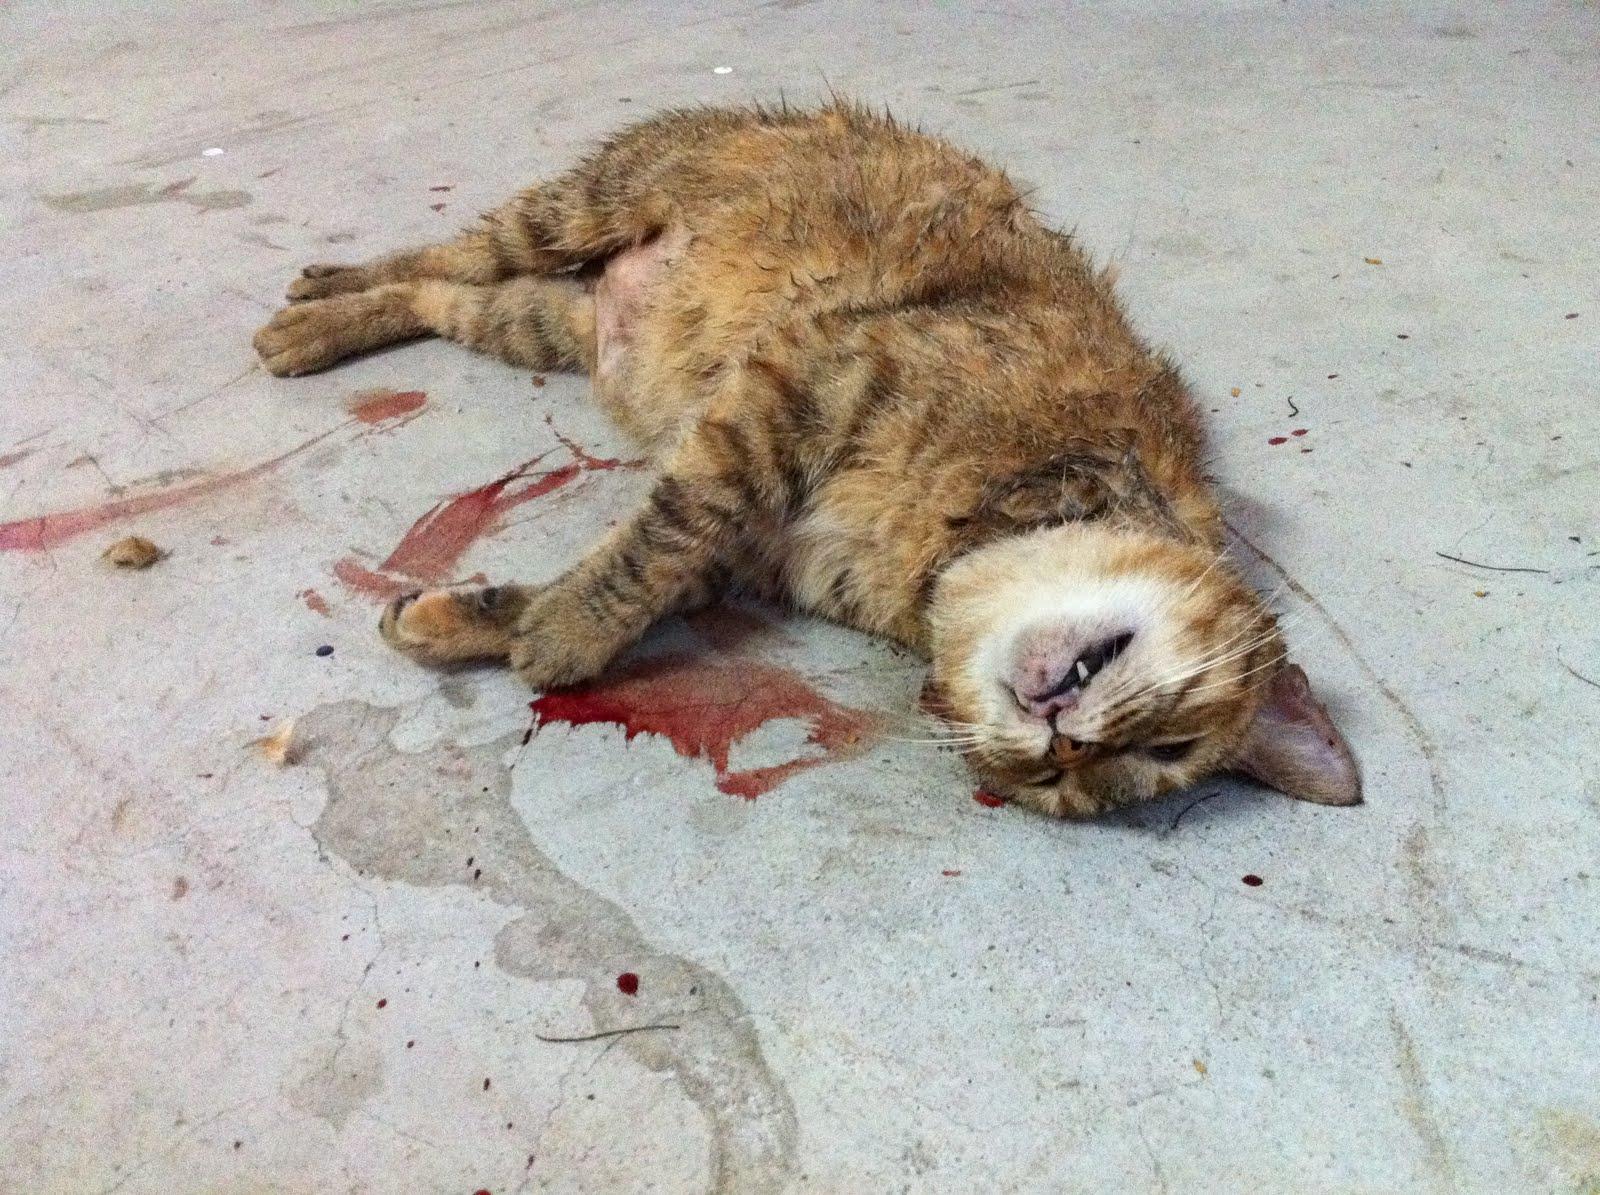 IMG_0064 stop animal abuse serial cat killer in singapore?